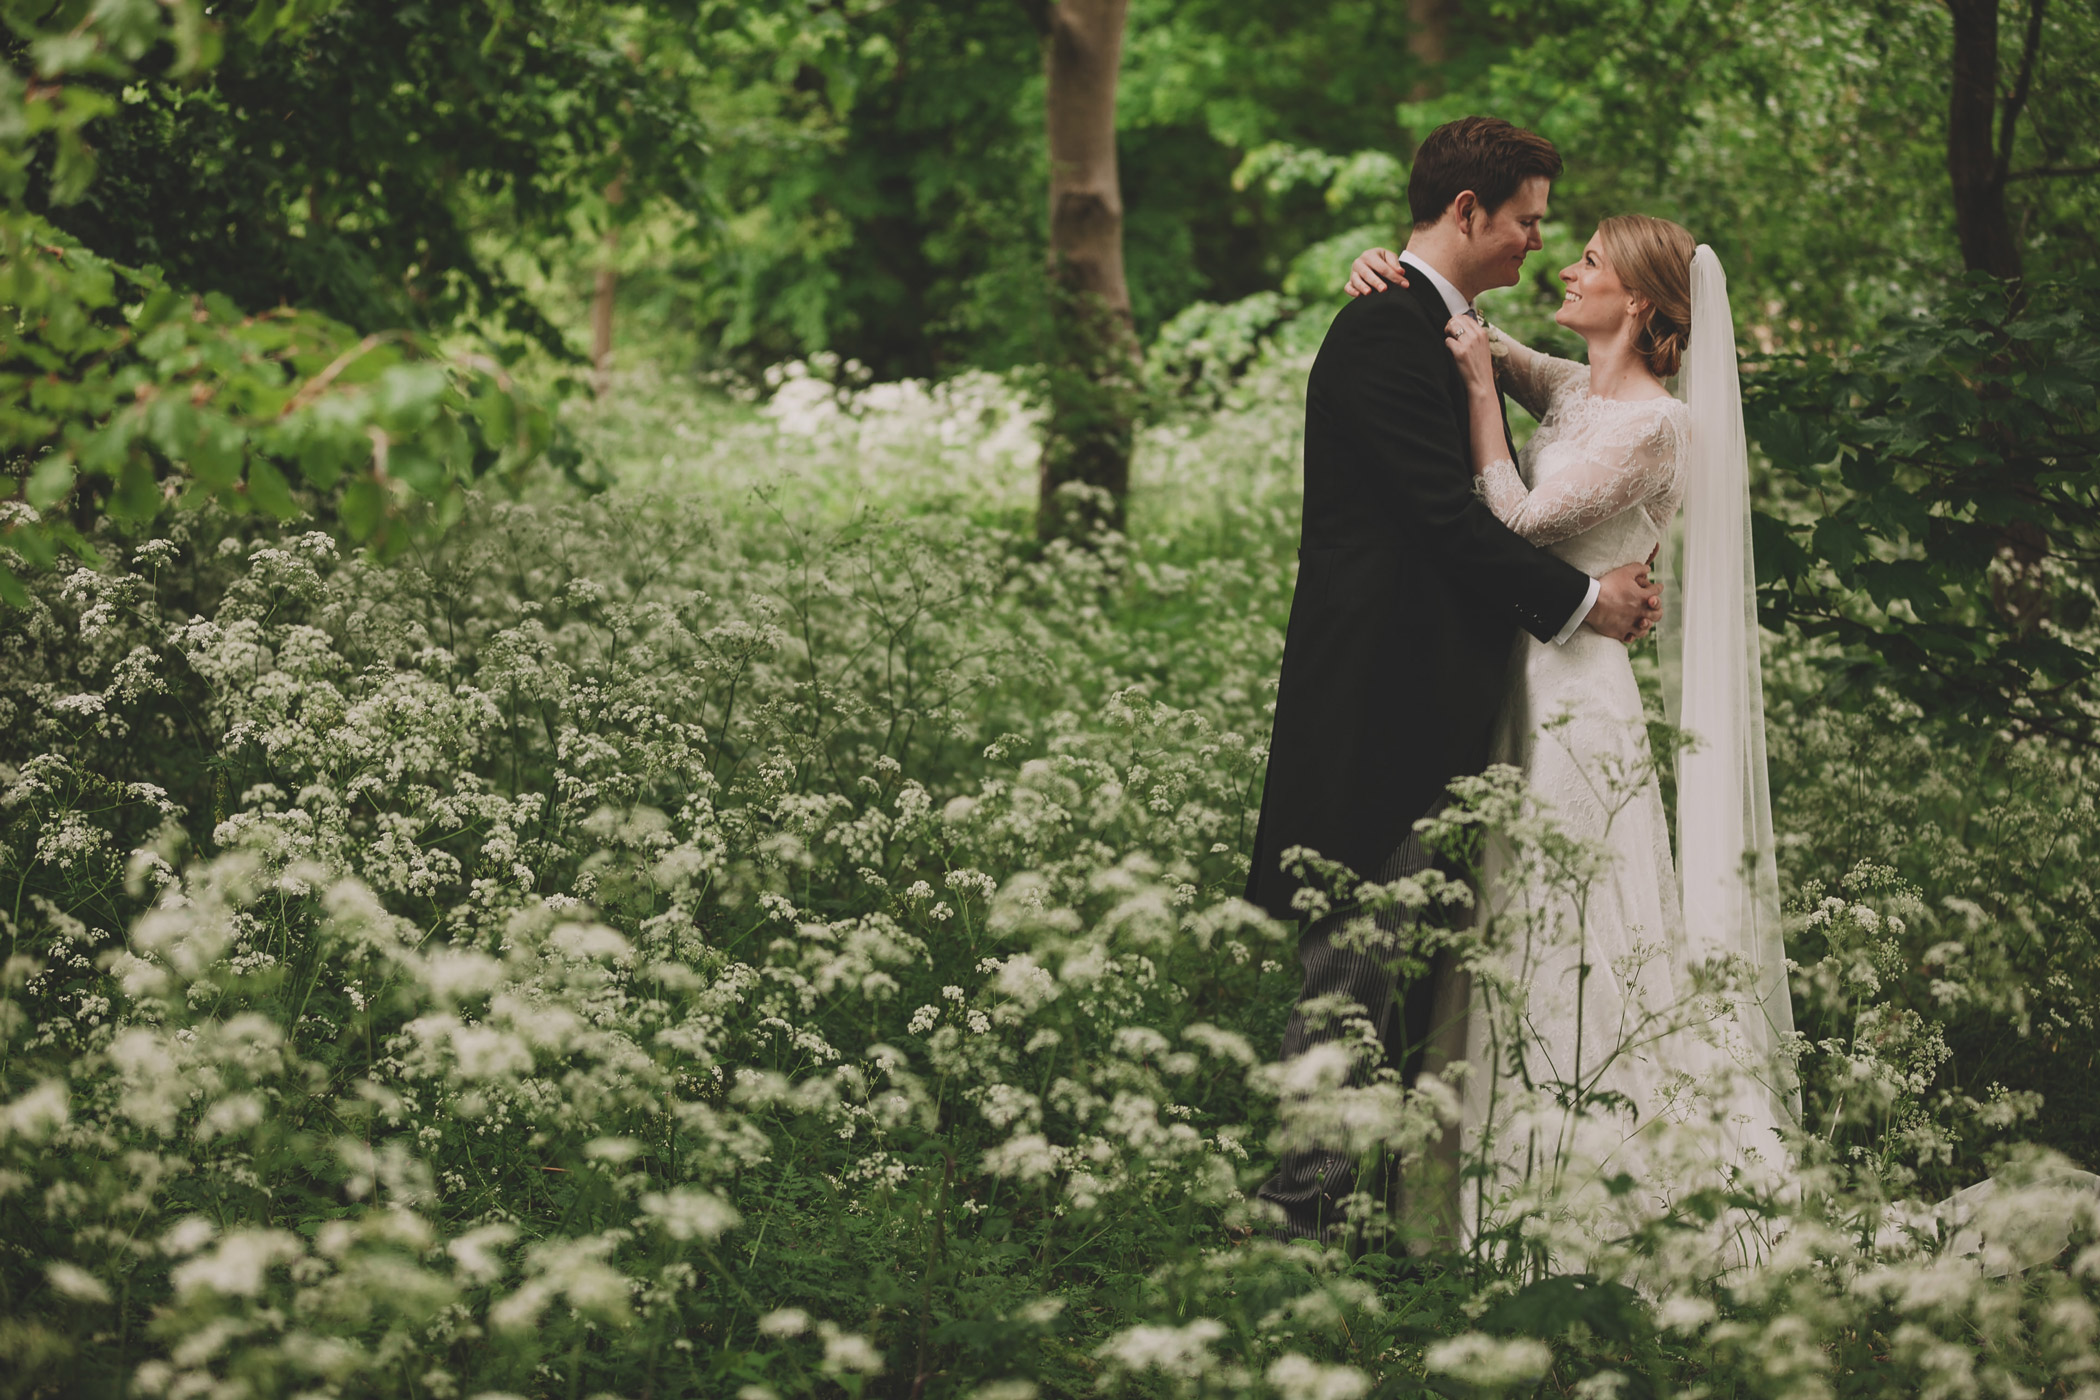 ruth-allen-wedding-photography-photographer-16